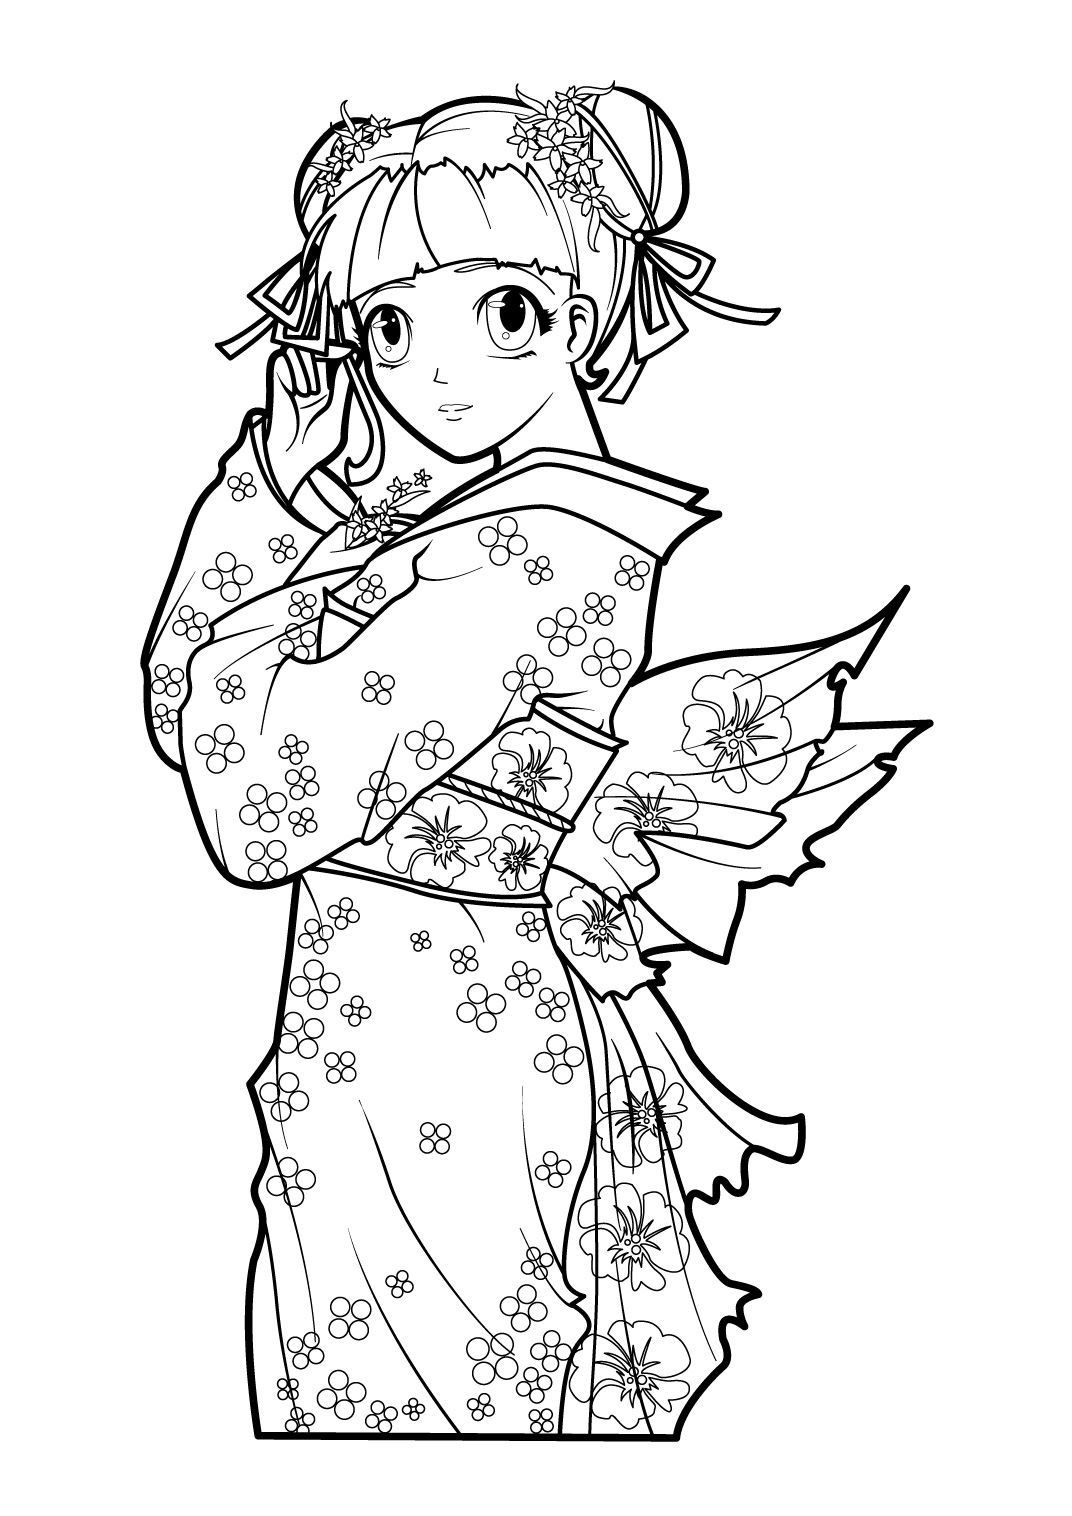 Coloriage Manga 1 Coloriage Mangas Coloriages Personnages